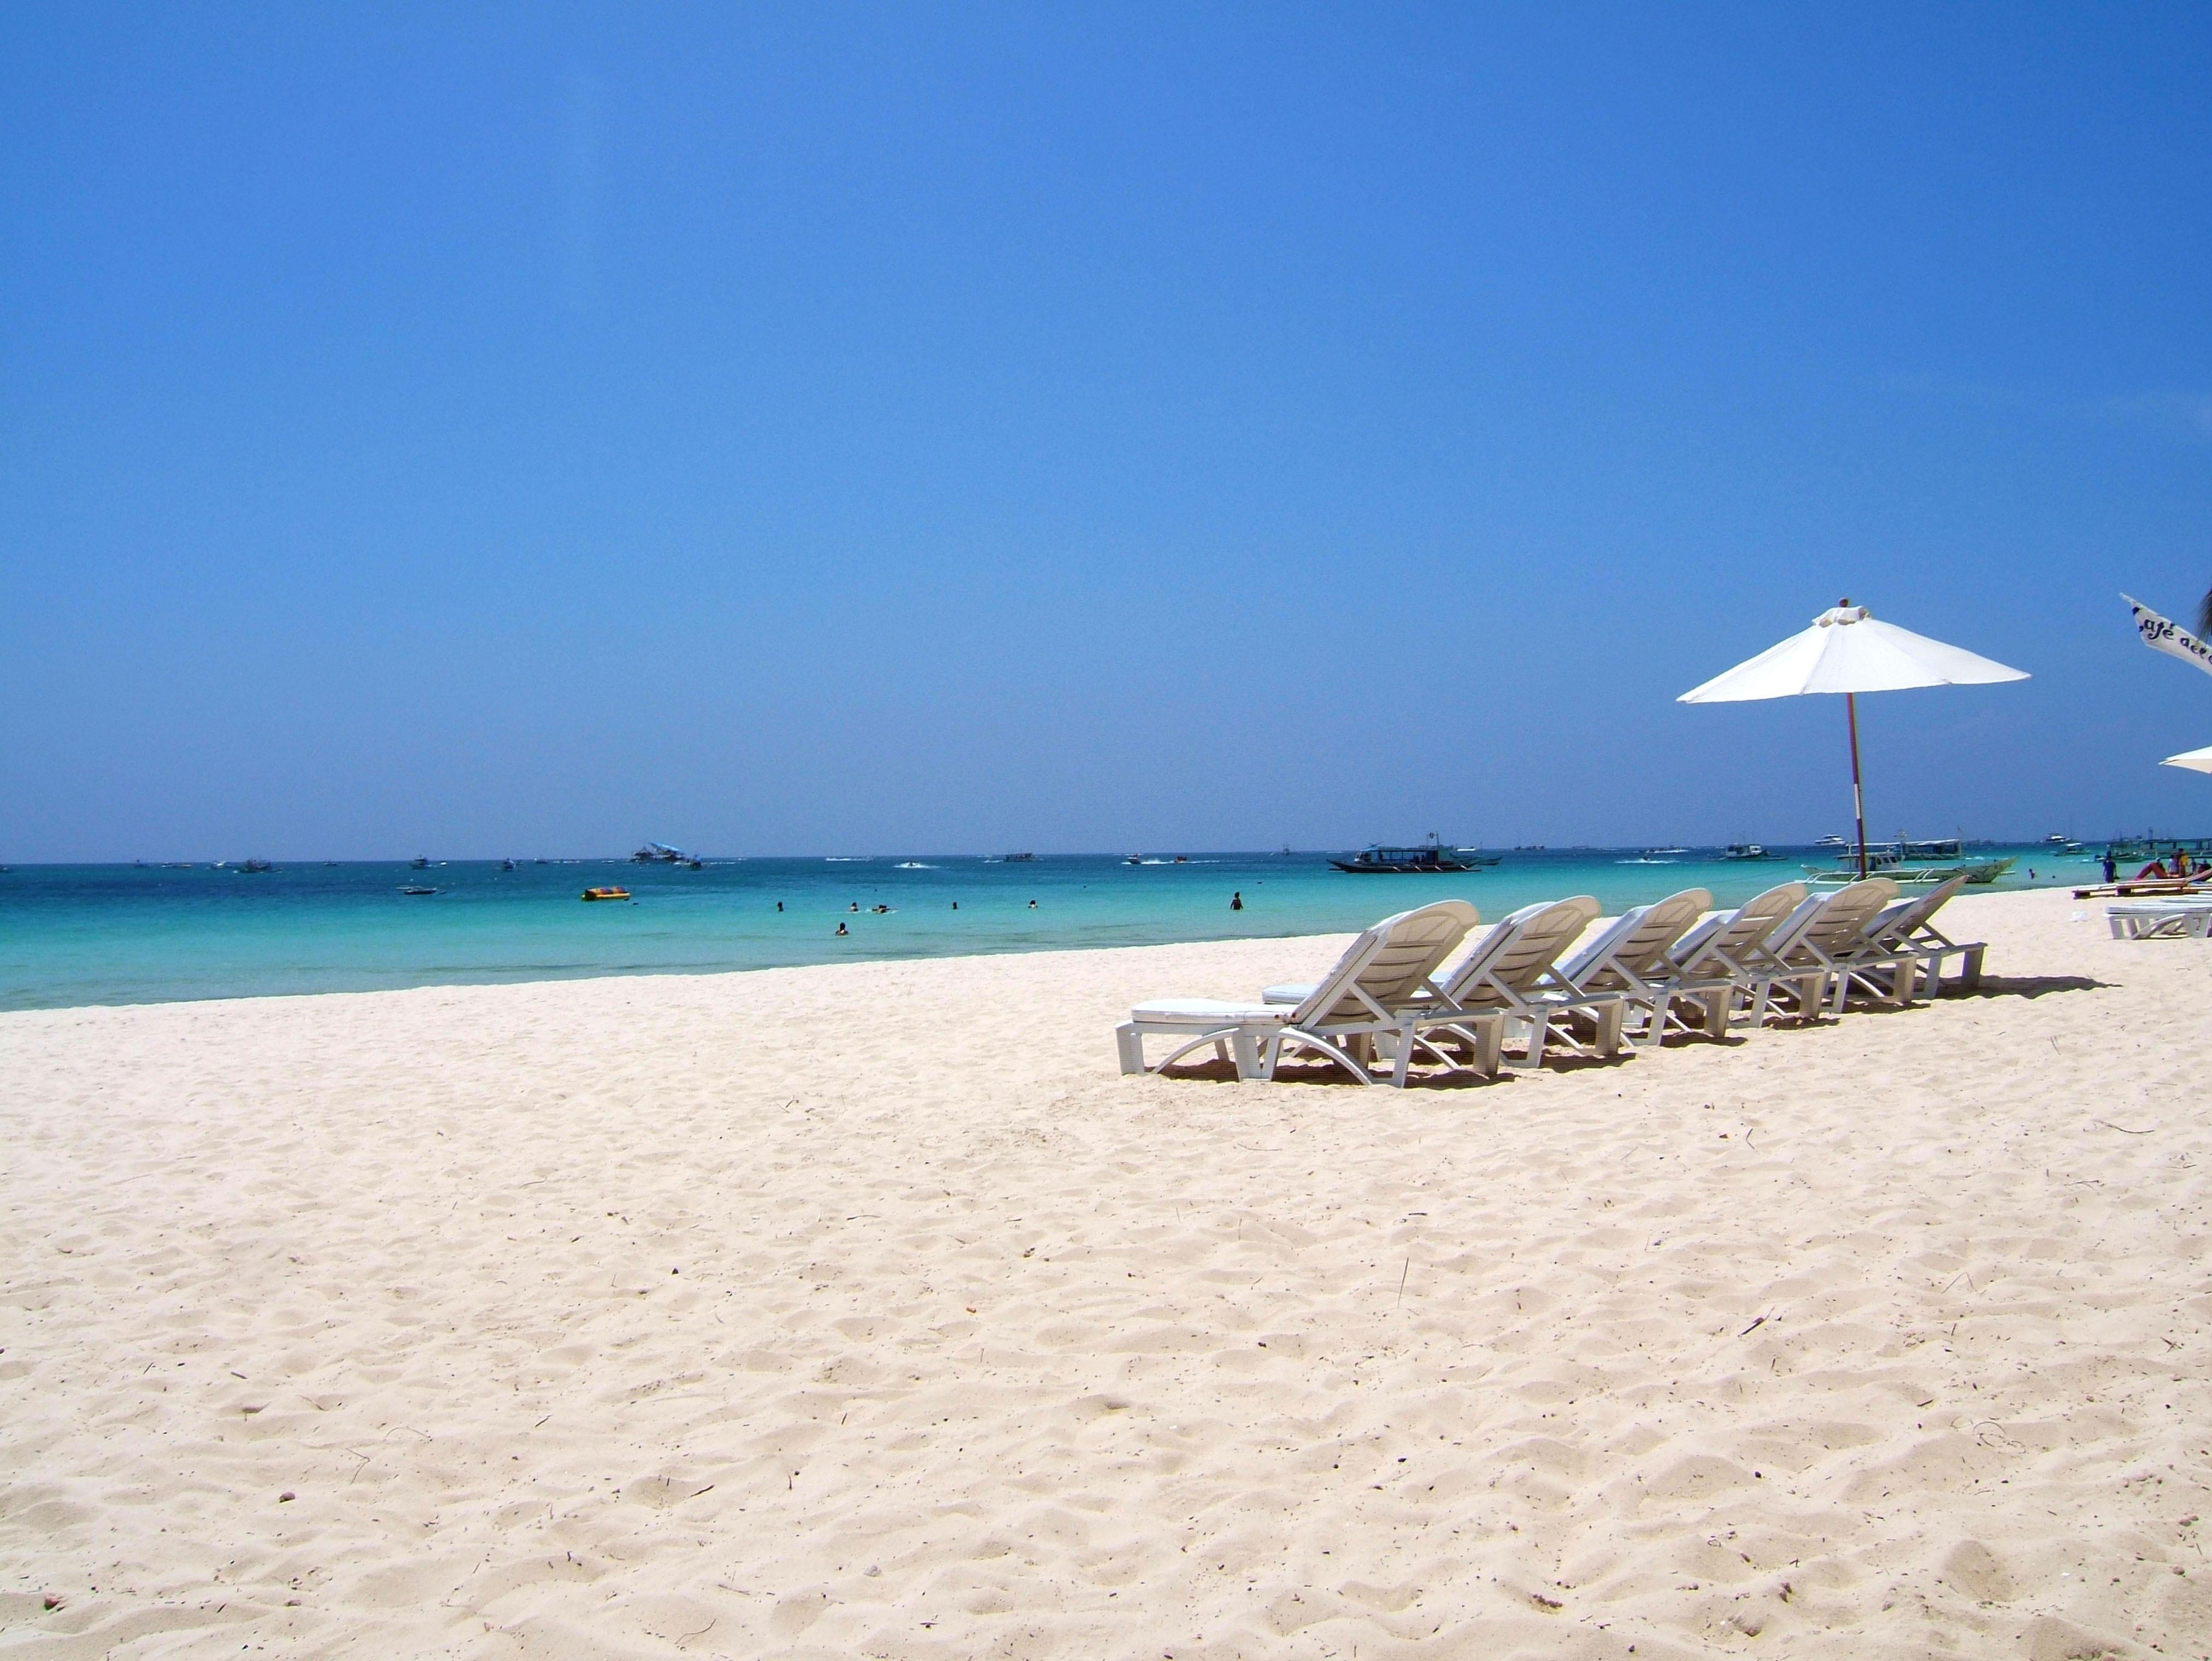 Philippines Panay Negros Sugar Islands Caticlan Boracay Beach Chairs 200604 02